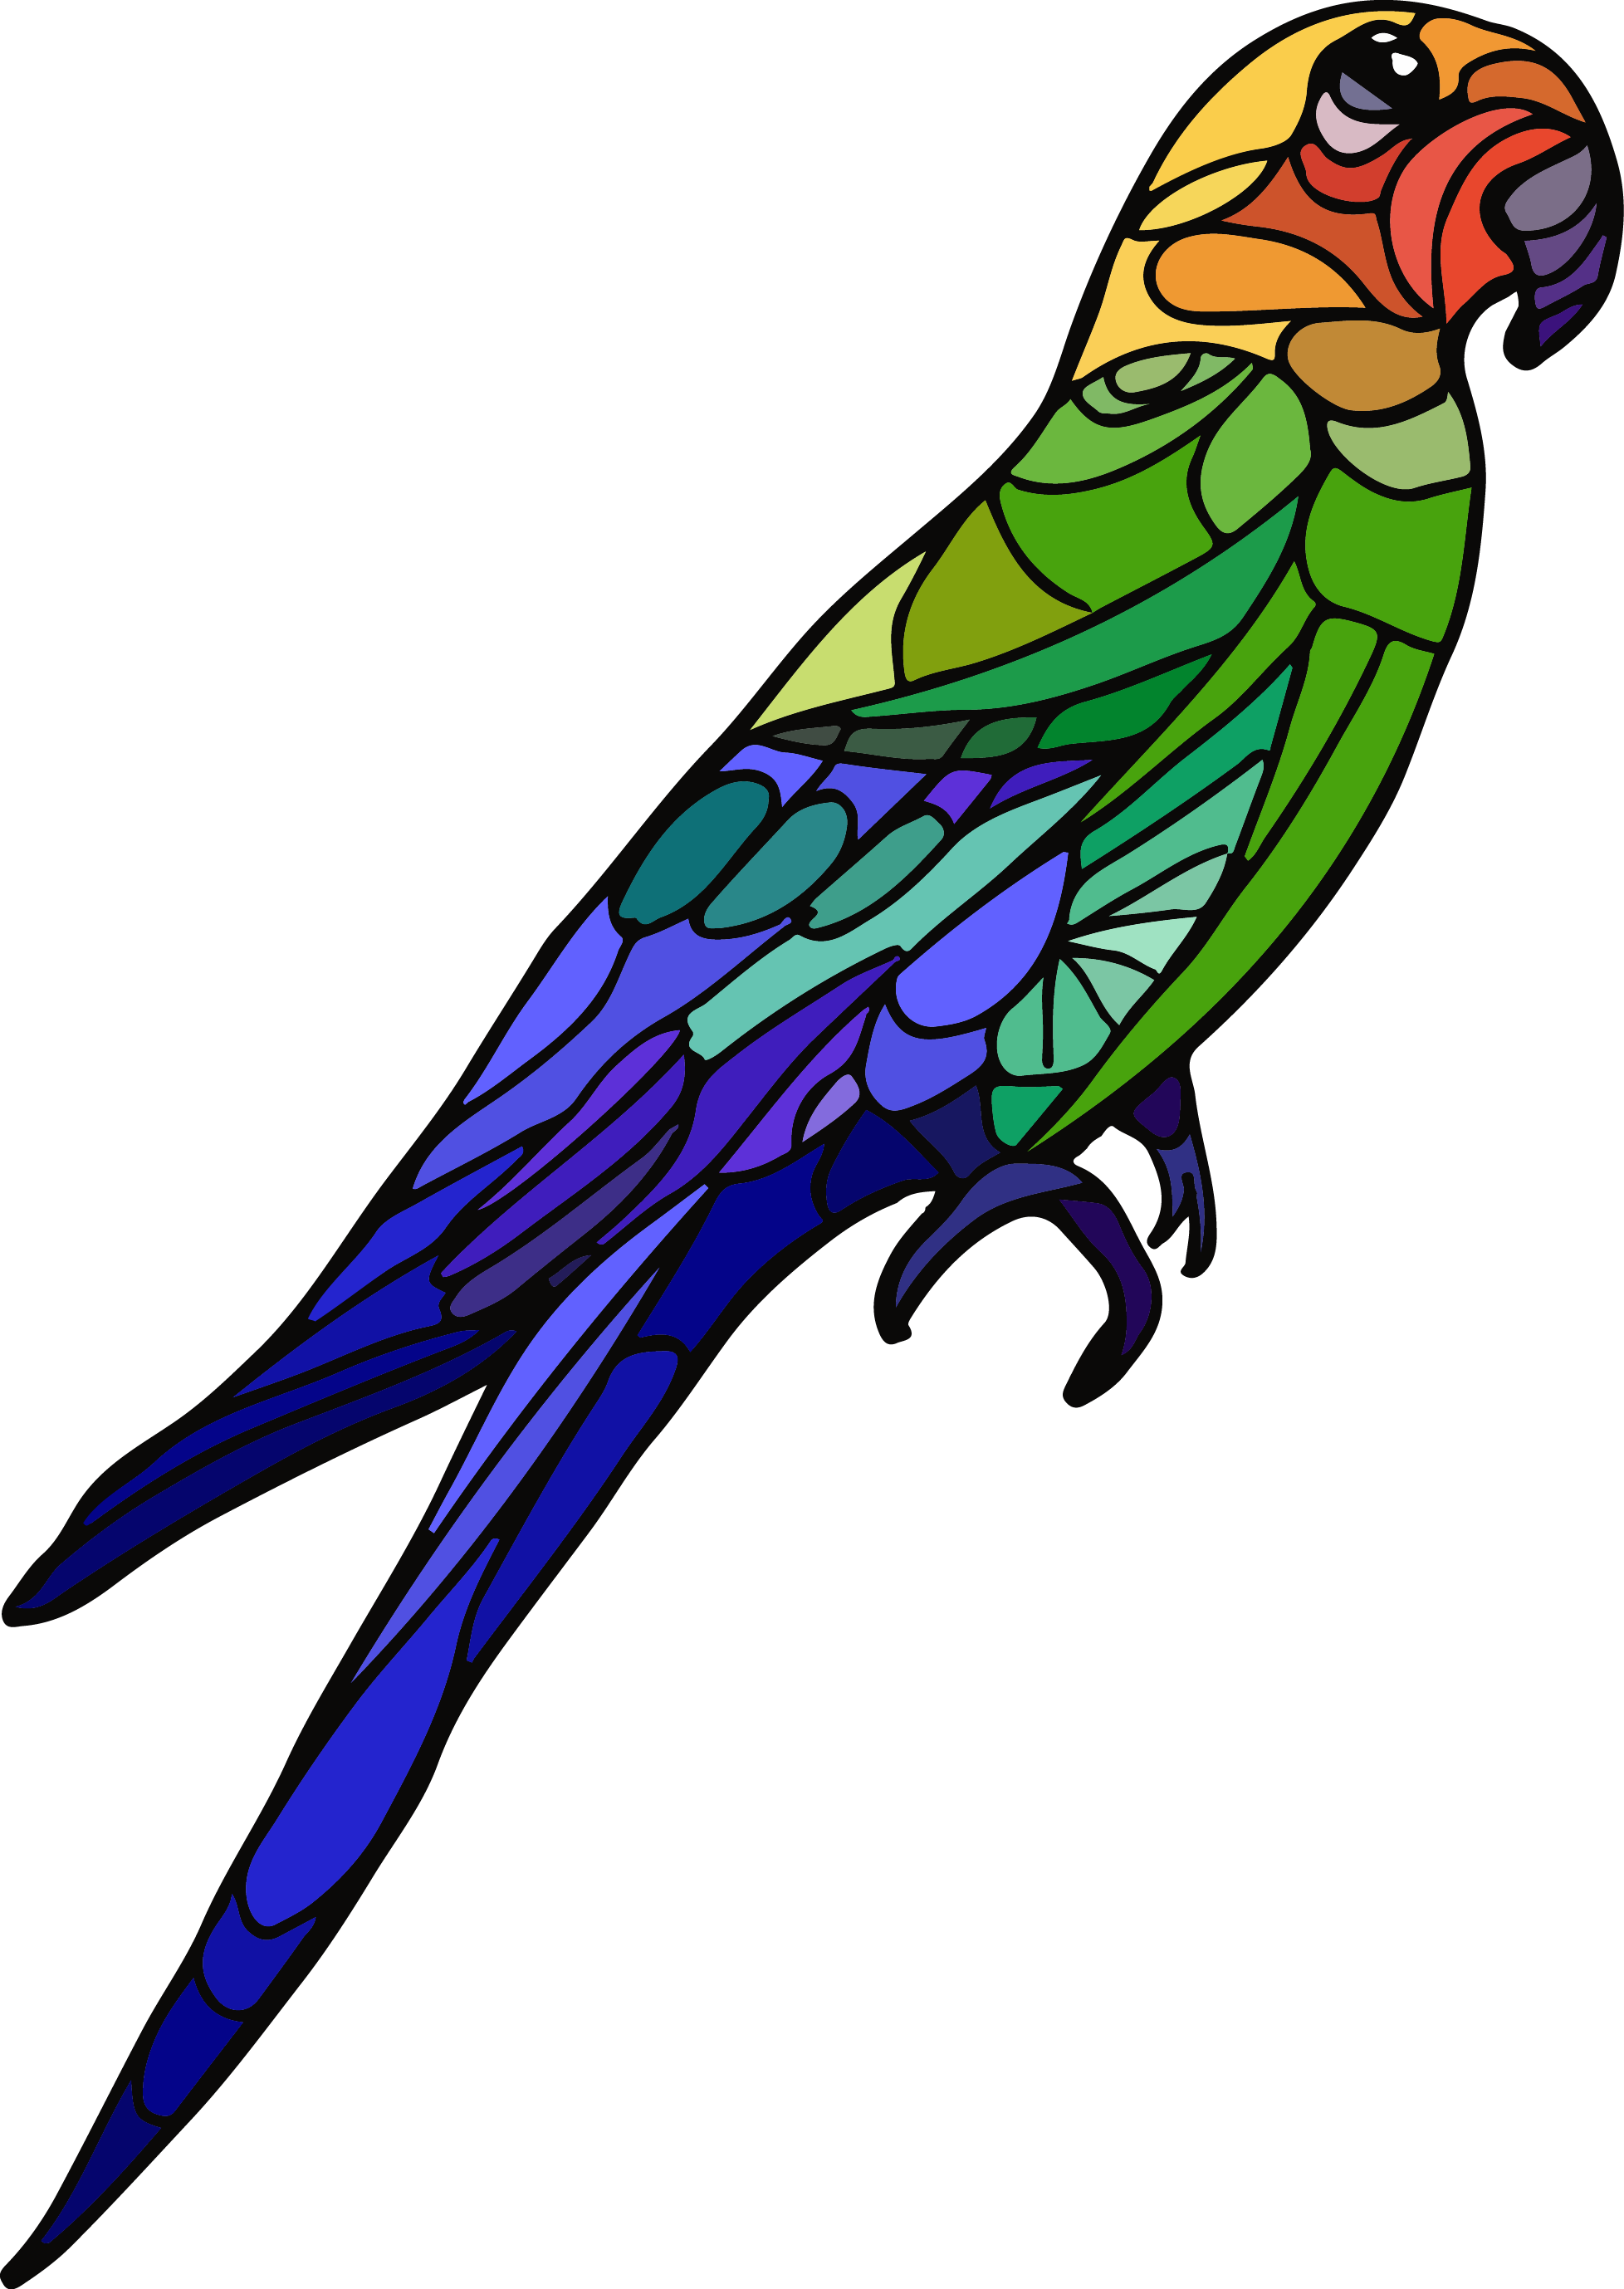 The Extinct Carolinaparaquet From The Efrstickers